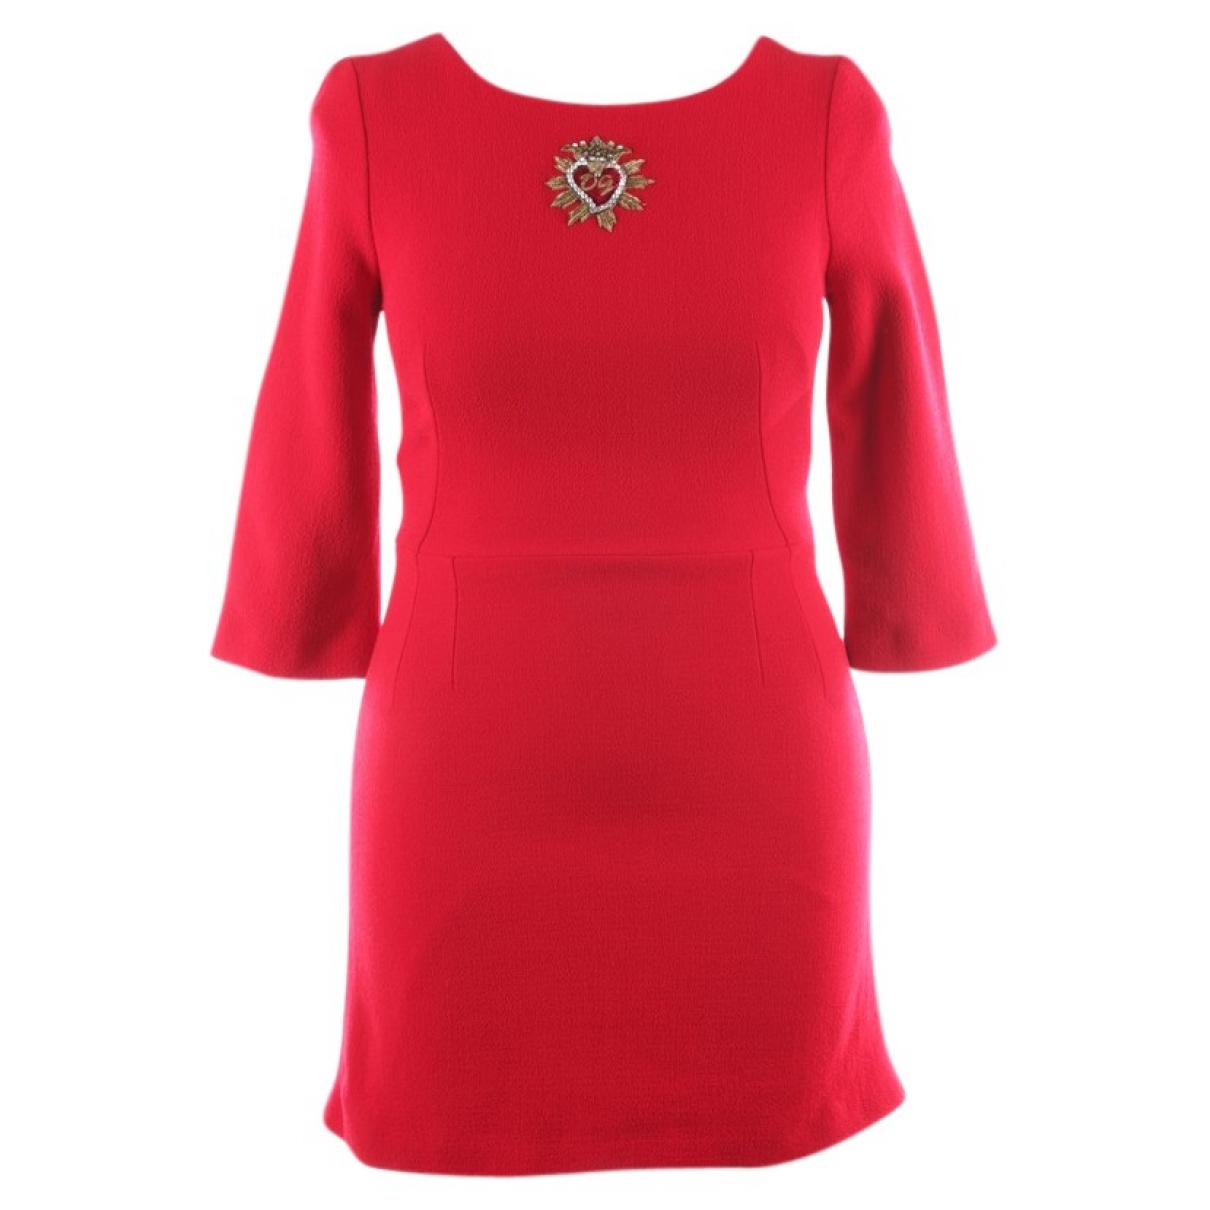 Dolce & Gabbana \N Kleid in  Rot Wolle